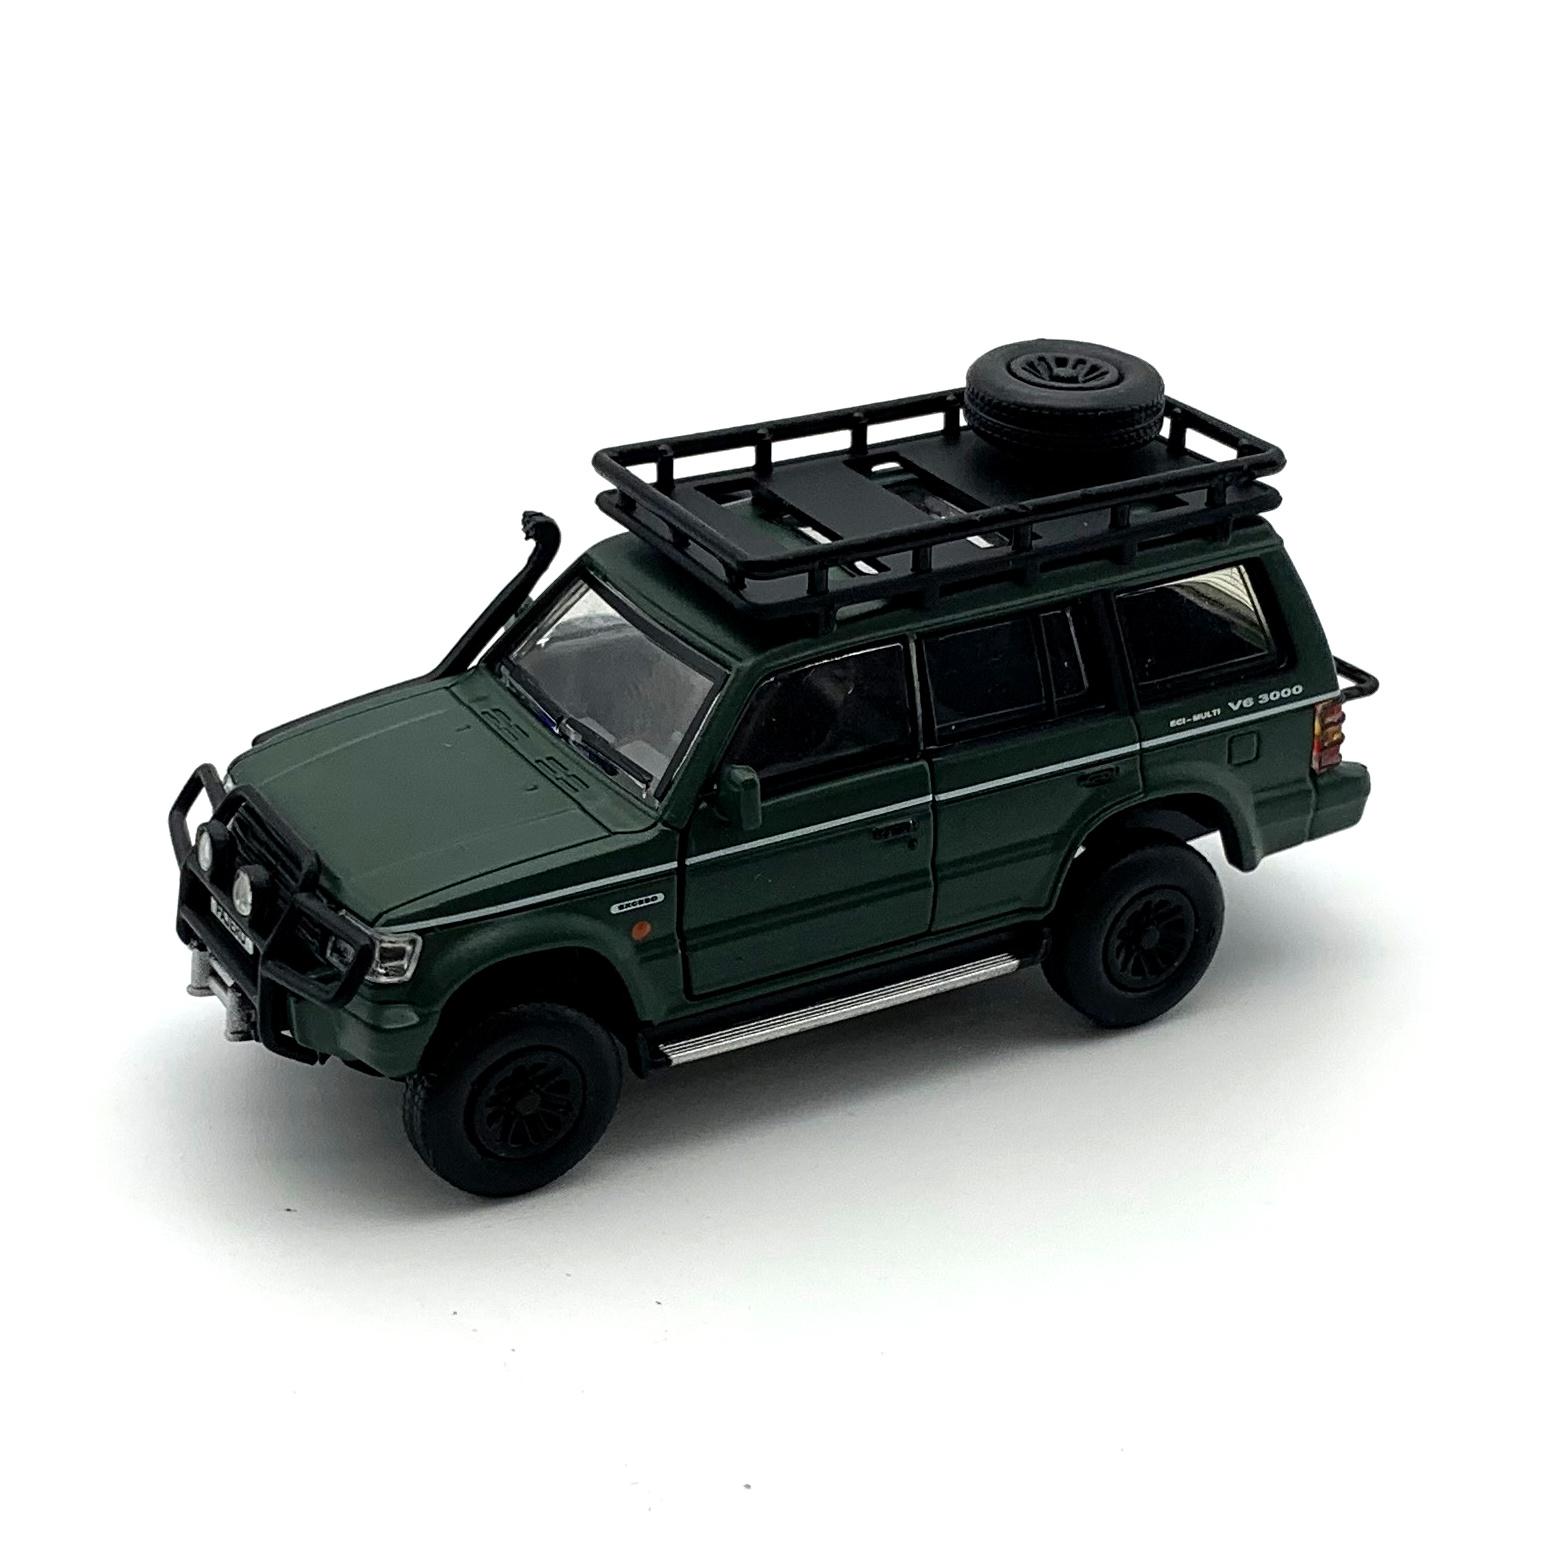 BM CREATIONS 三菱 パジェロ 2nd Generation マットグリーン Jungle pack  LHD